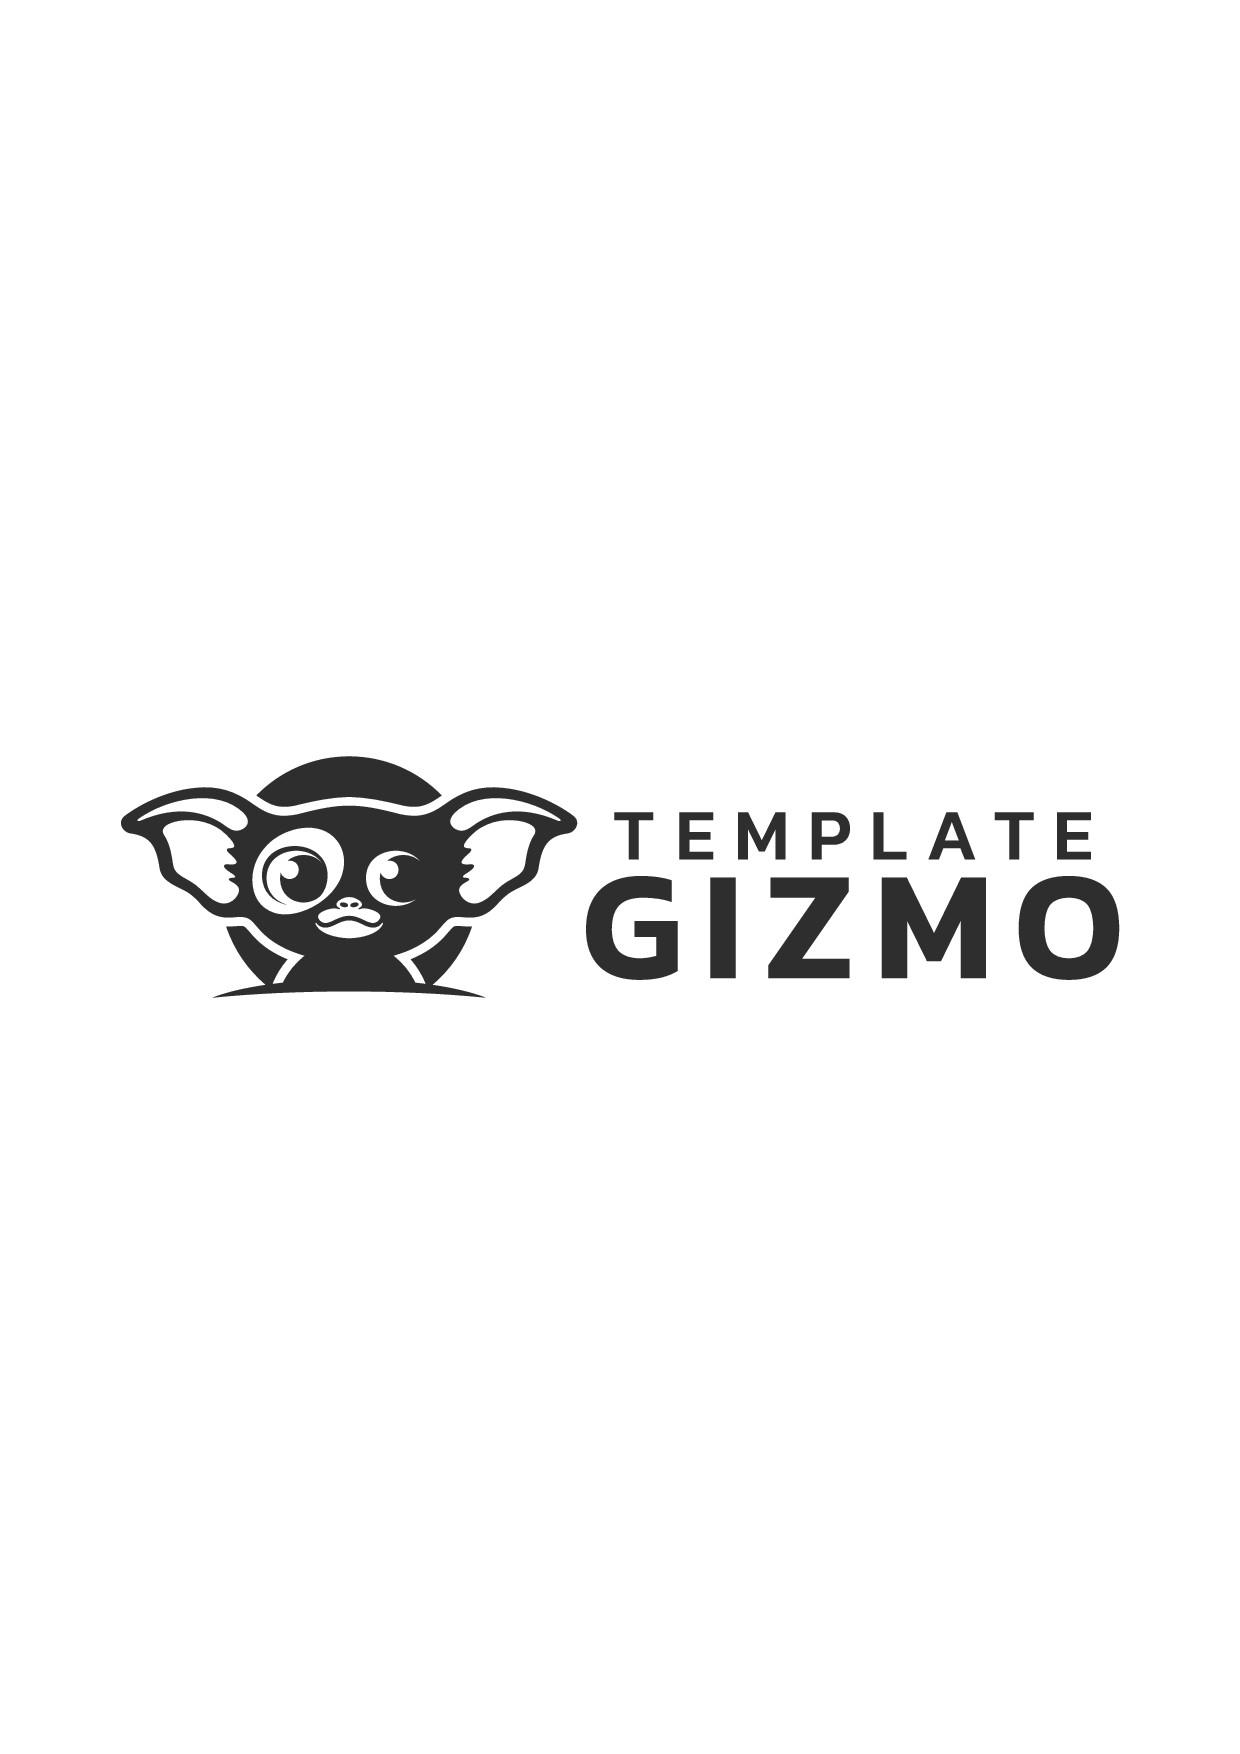 Creative logo for web design marketplace